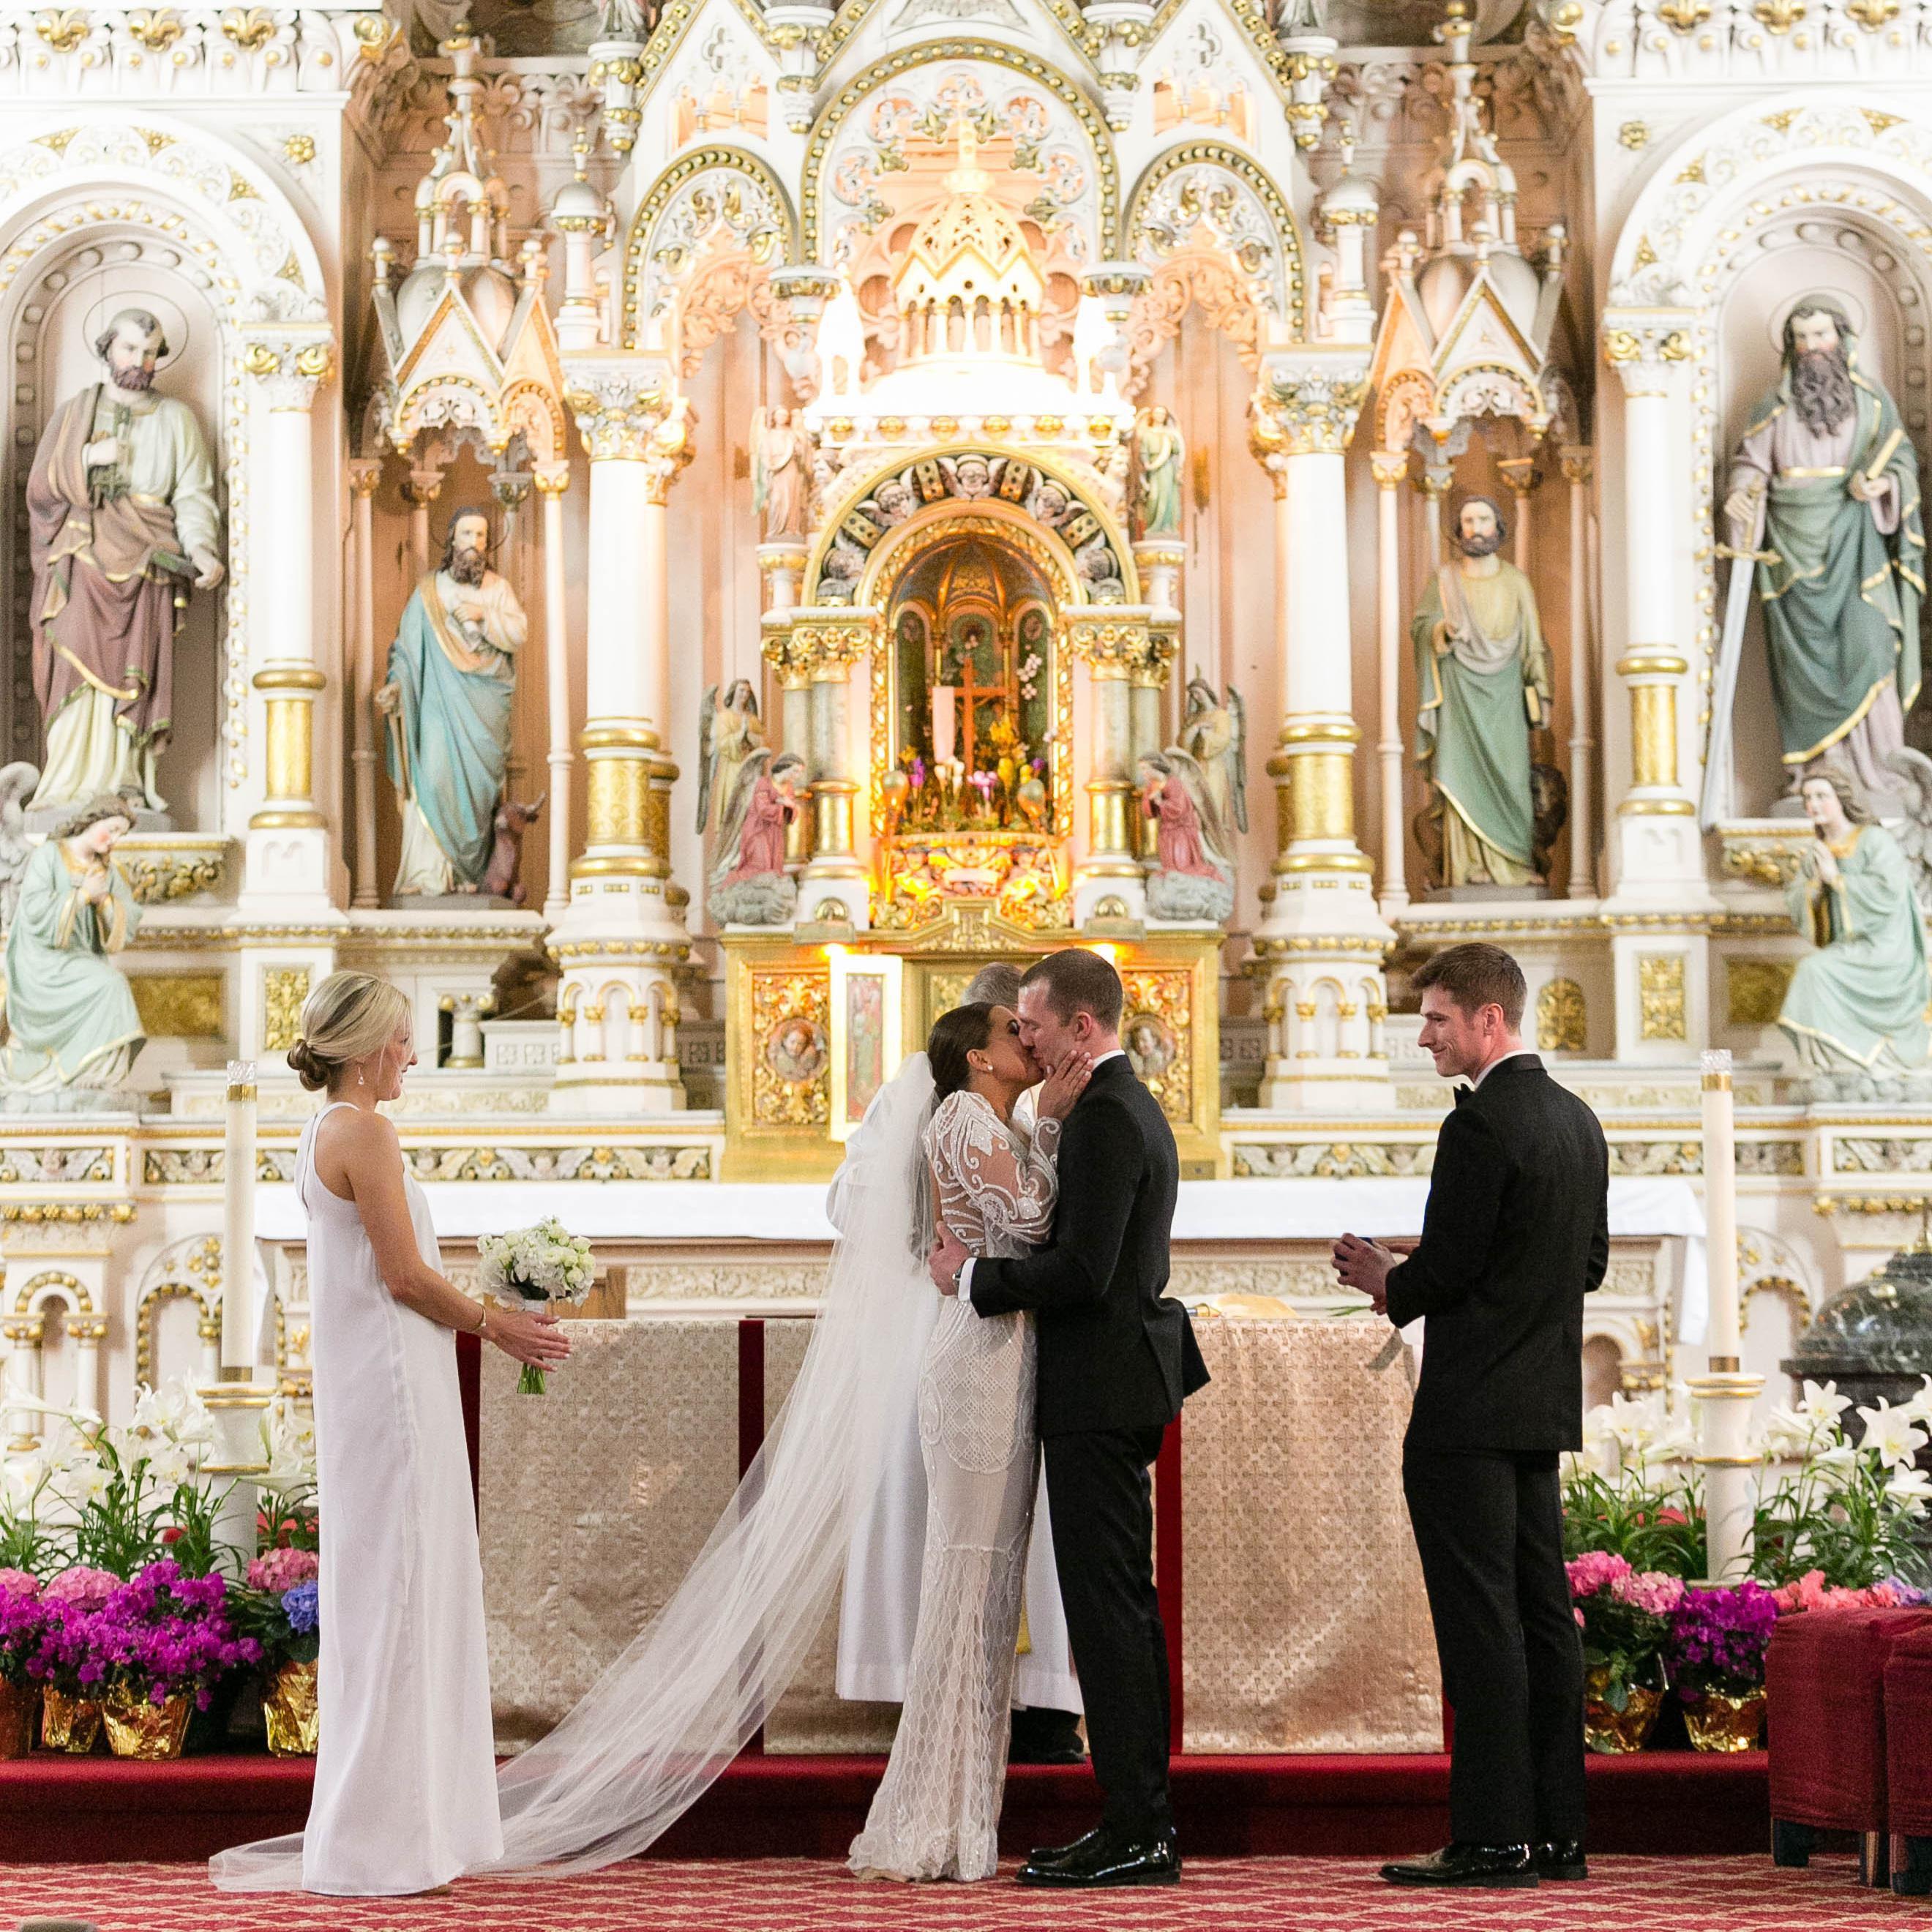 How To Prepare For A Catholic Church Wedding